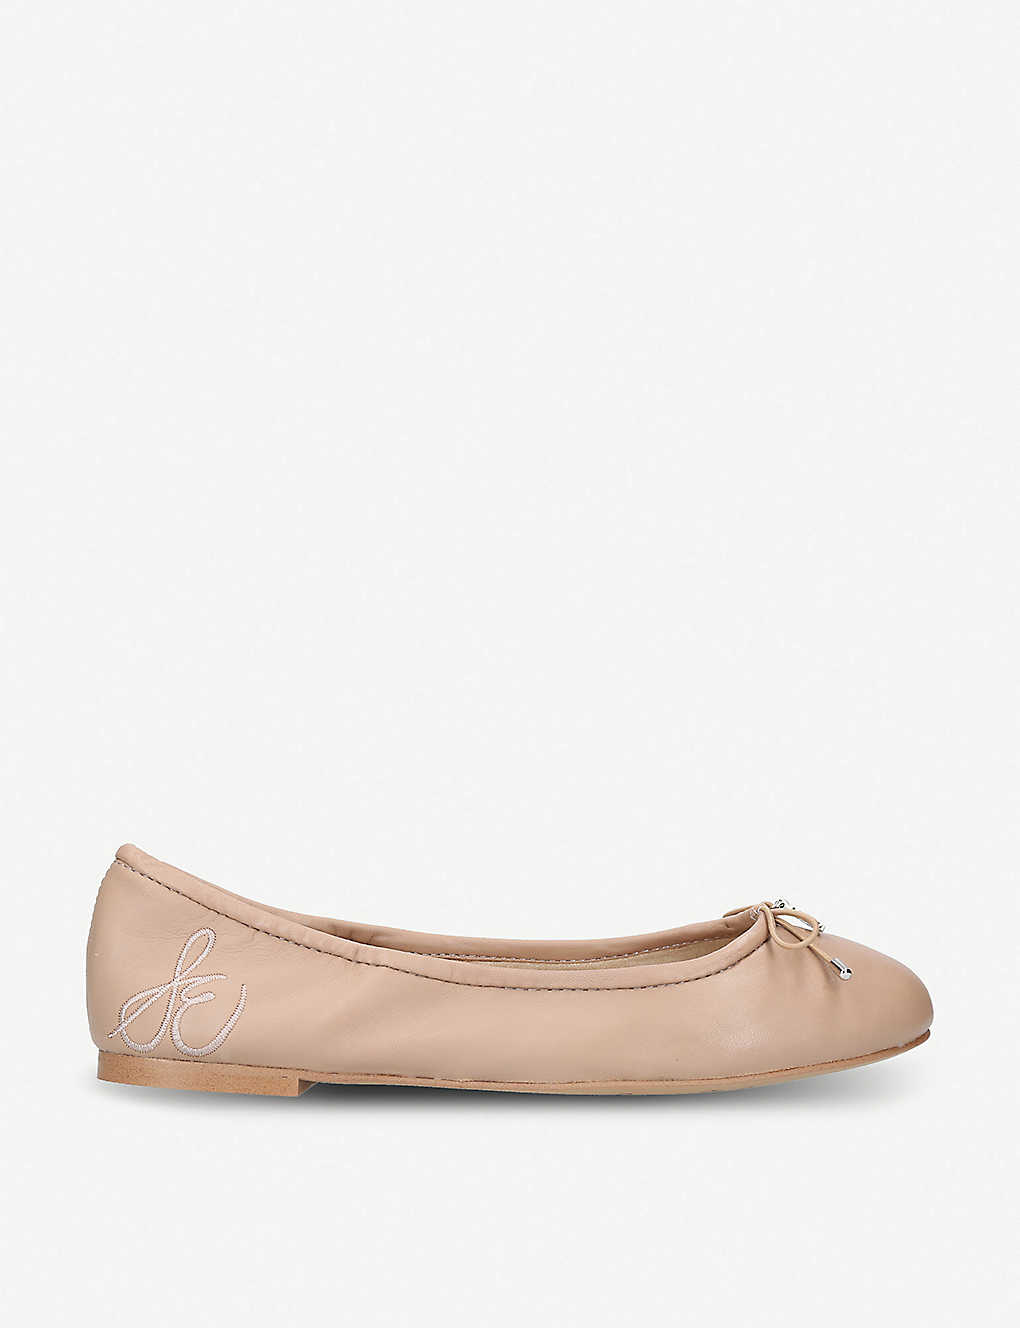 f05cabddab1b SAM EDELMAN - Felicia bow-detail leather ballet flats | Selfridges.com